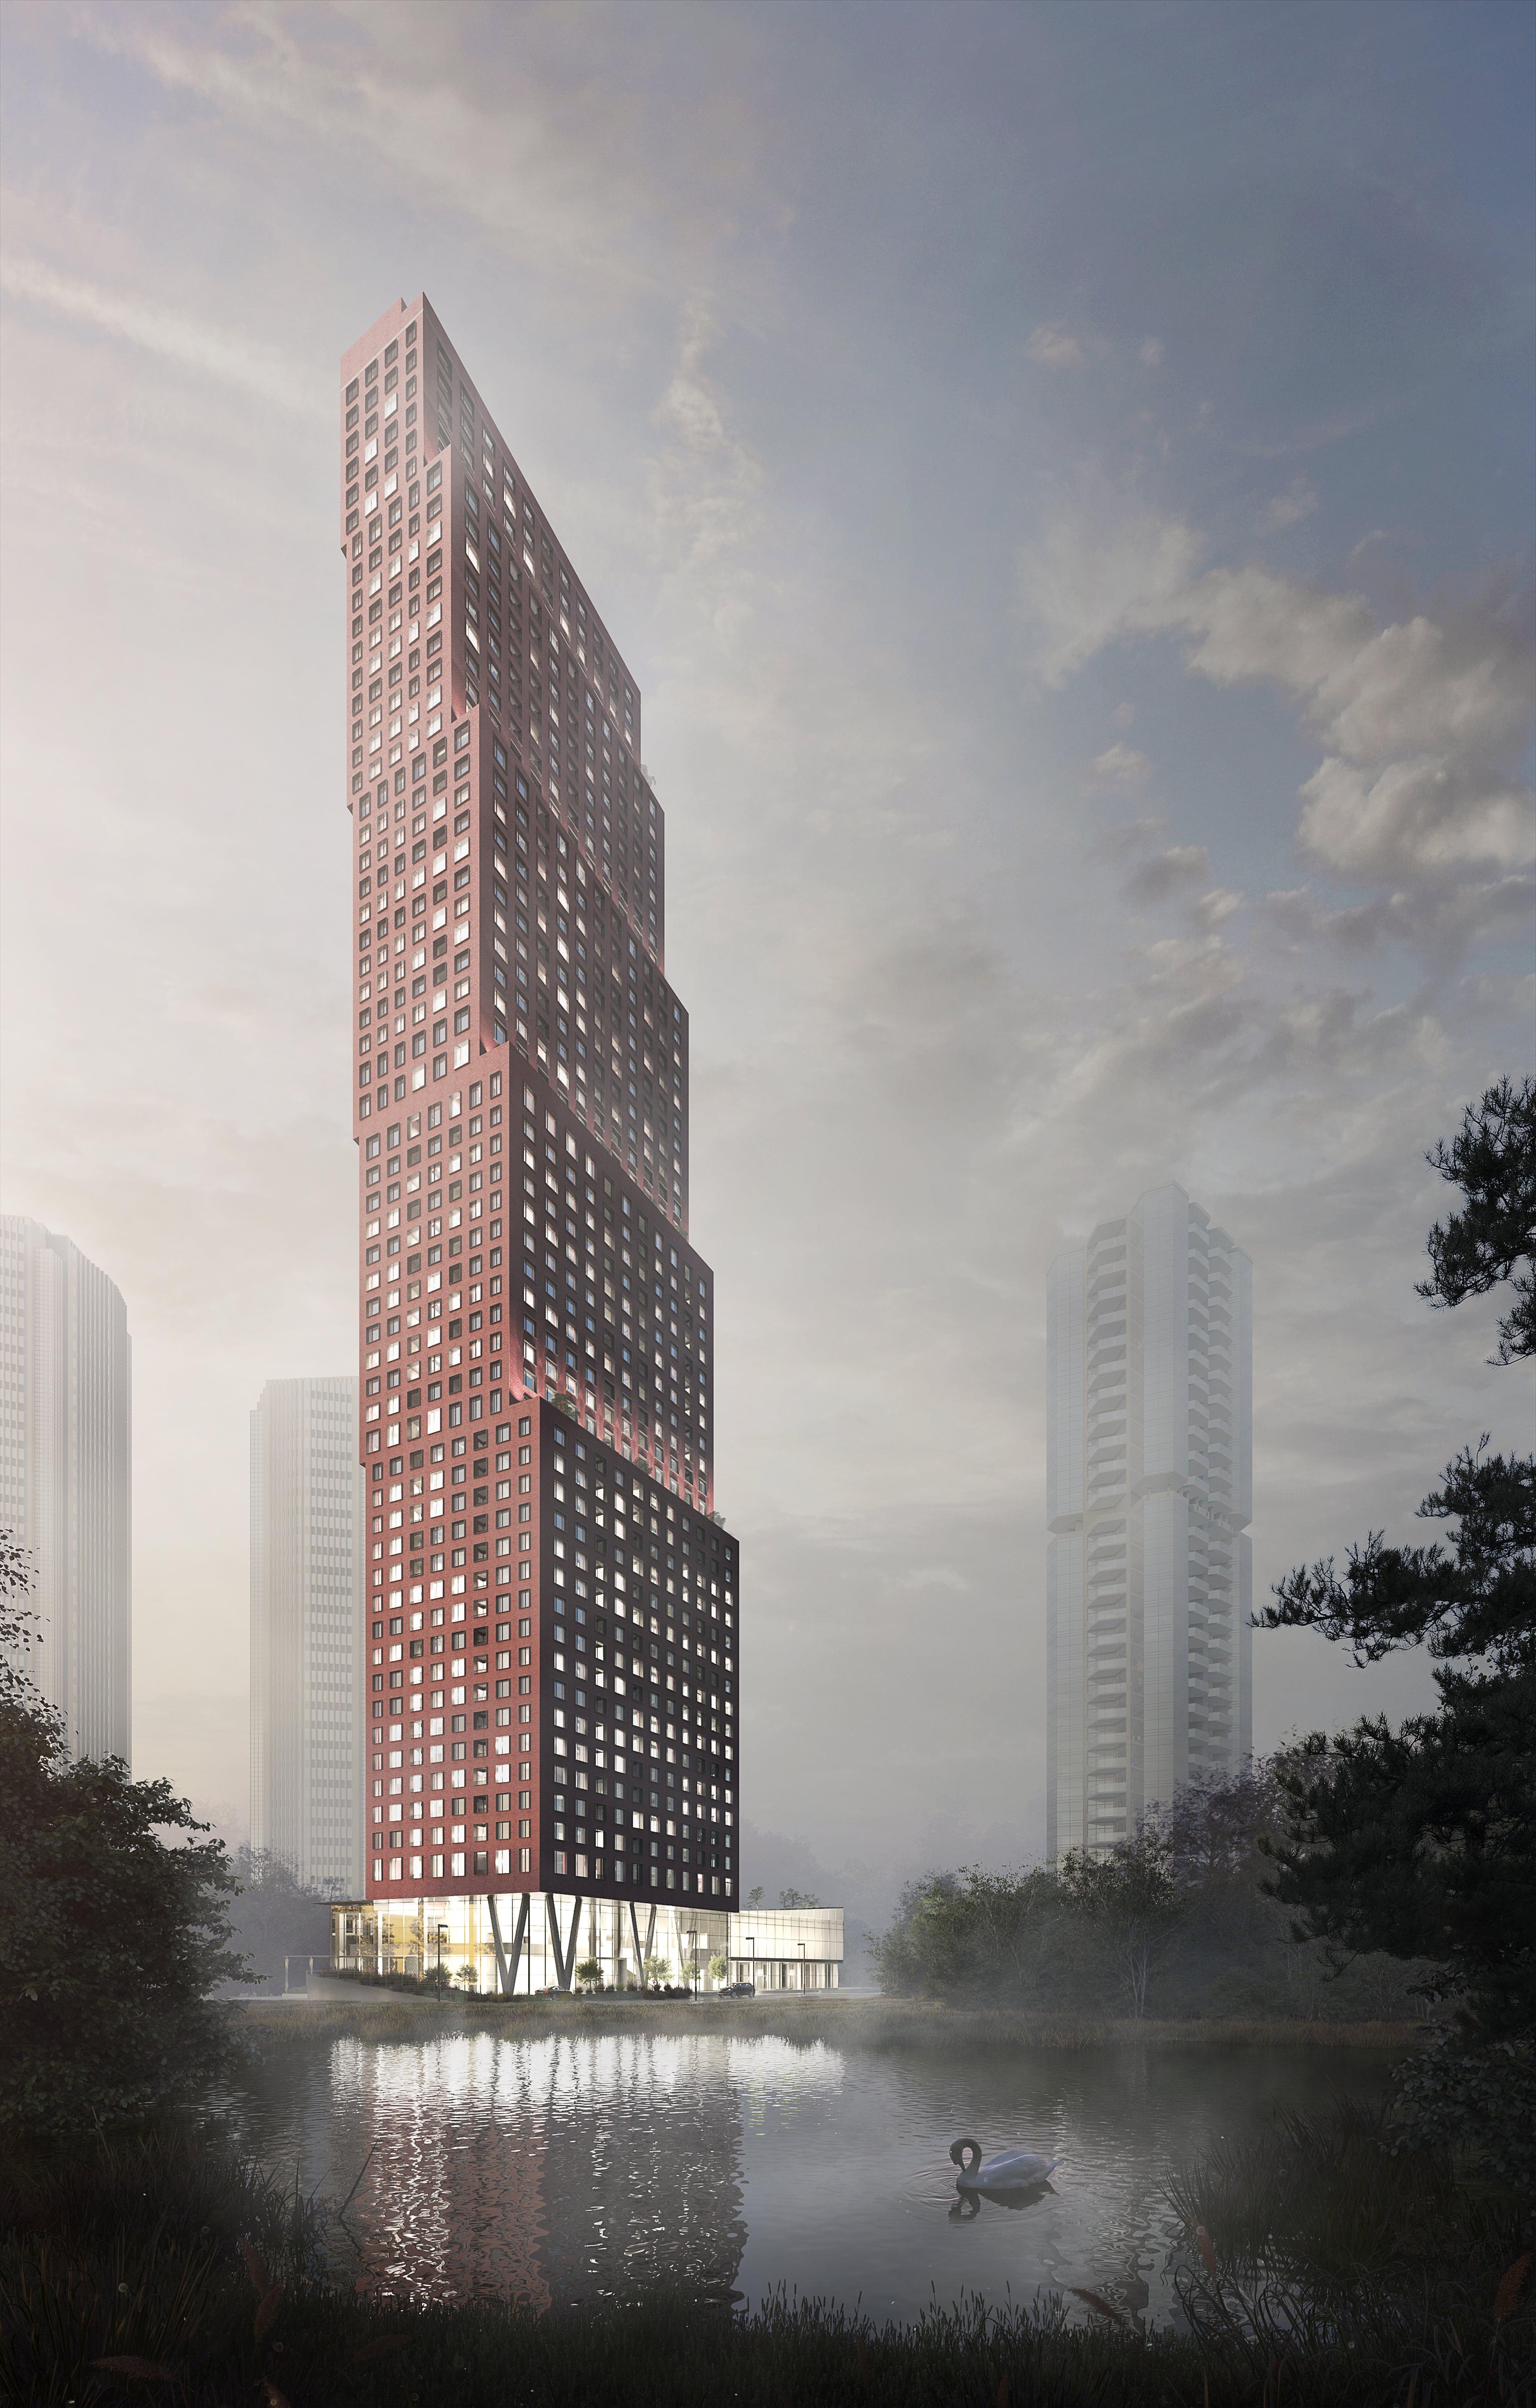 Expo city tower 5 image-vaughanexpocondo